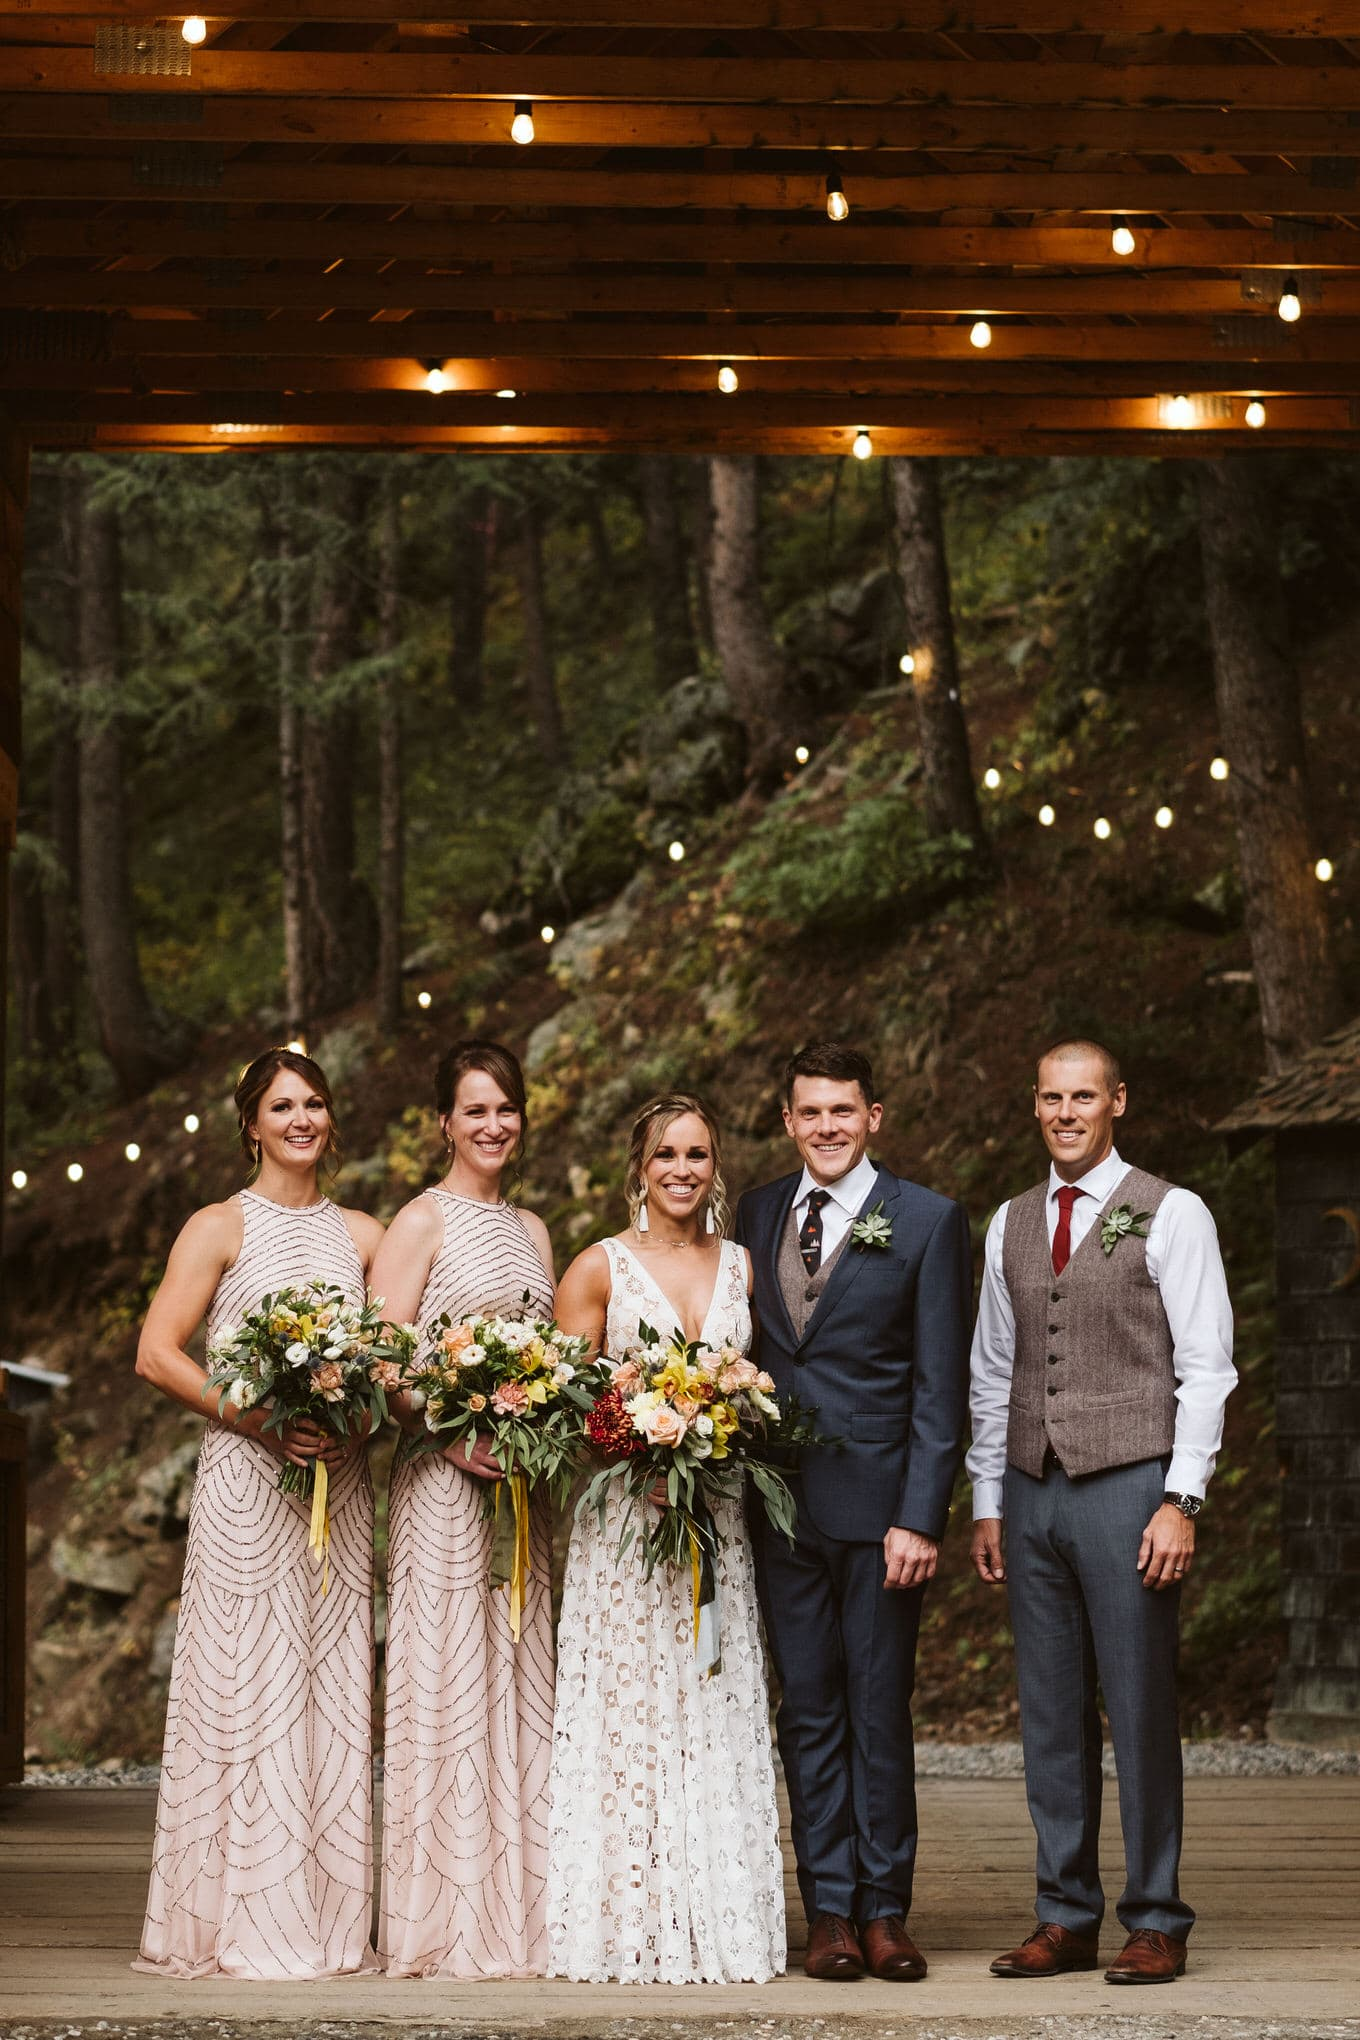 Wedding party at Blackstone Rivers Ranch in Idaho Springs